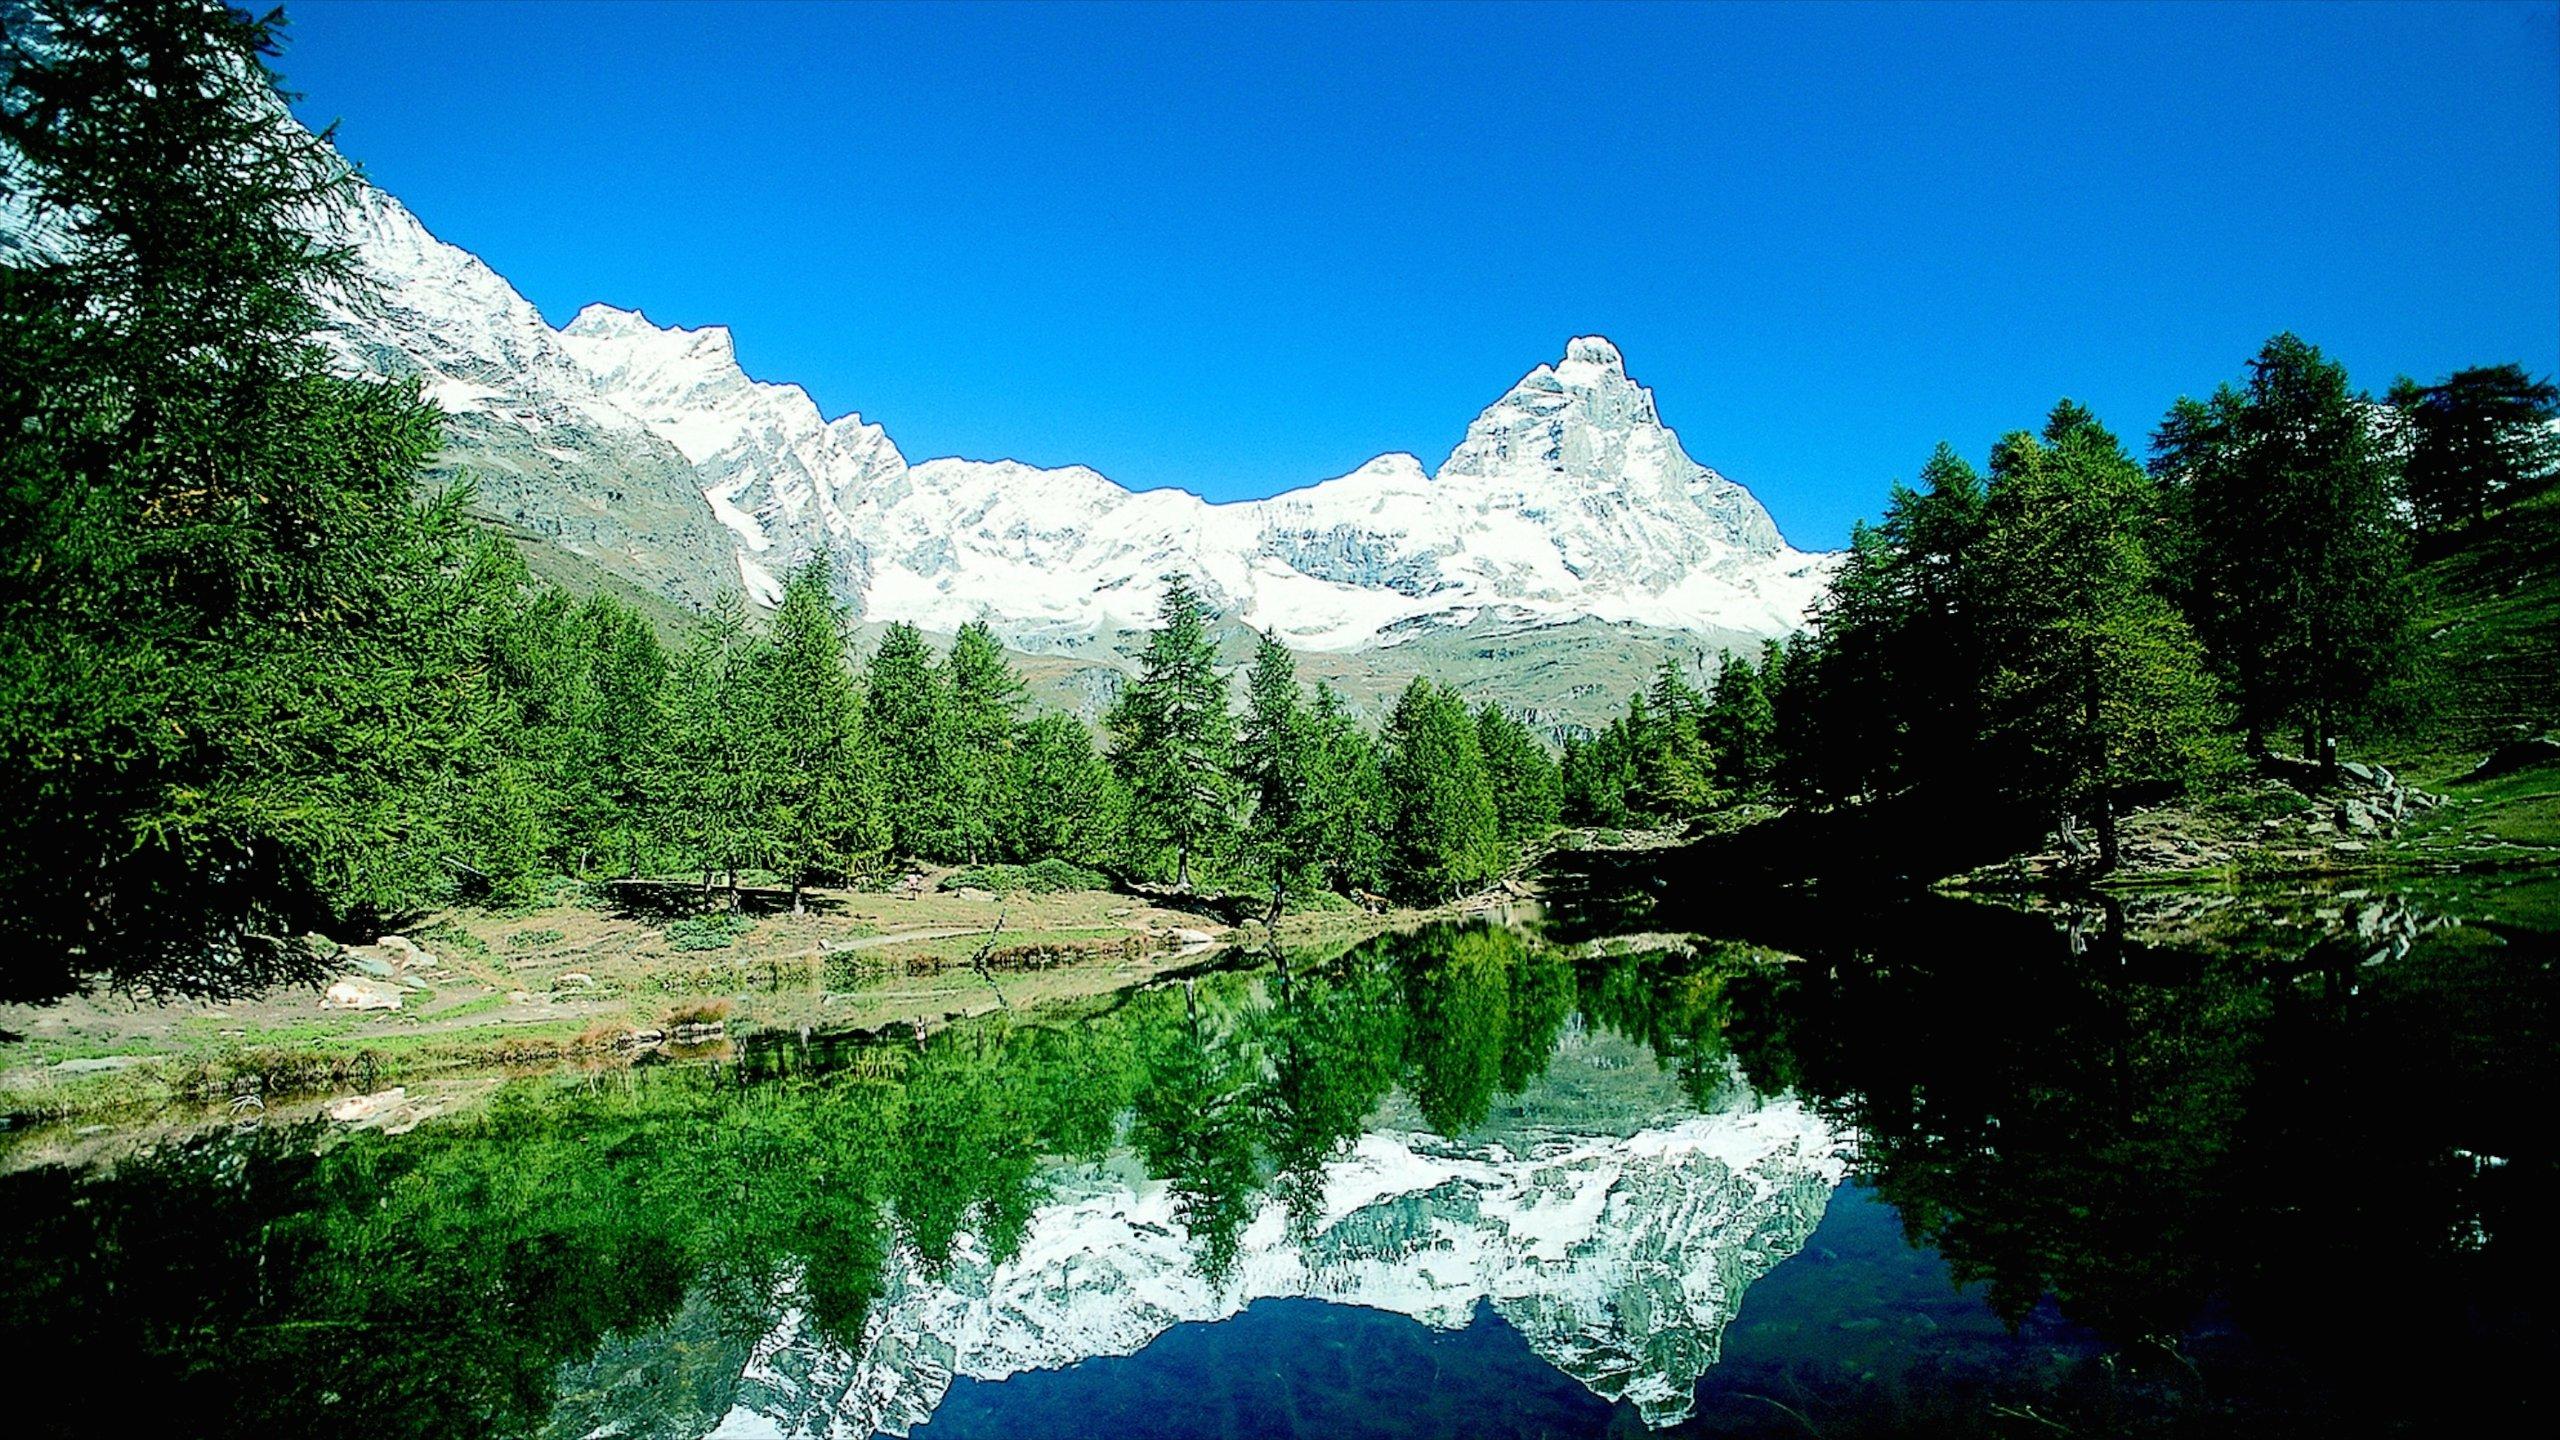 Paquier, Valtournanche, Valle d'Aosta, Italia